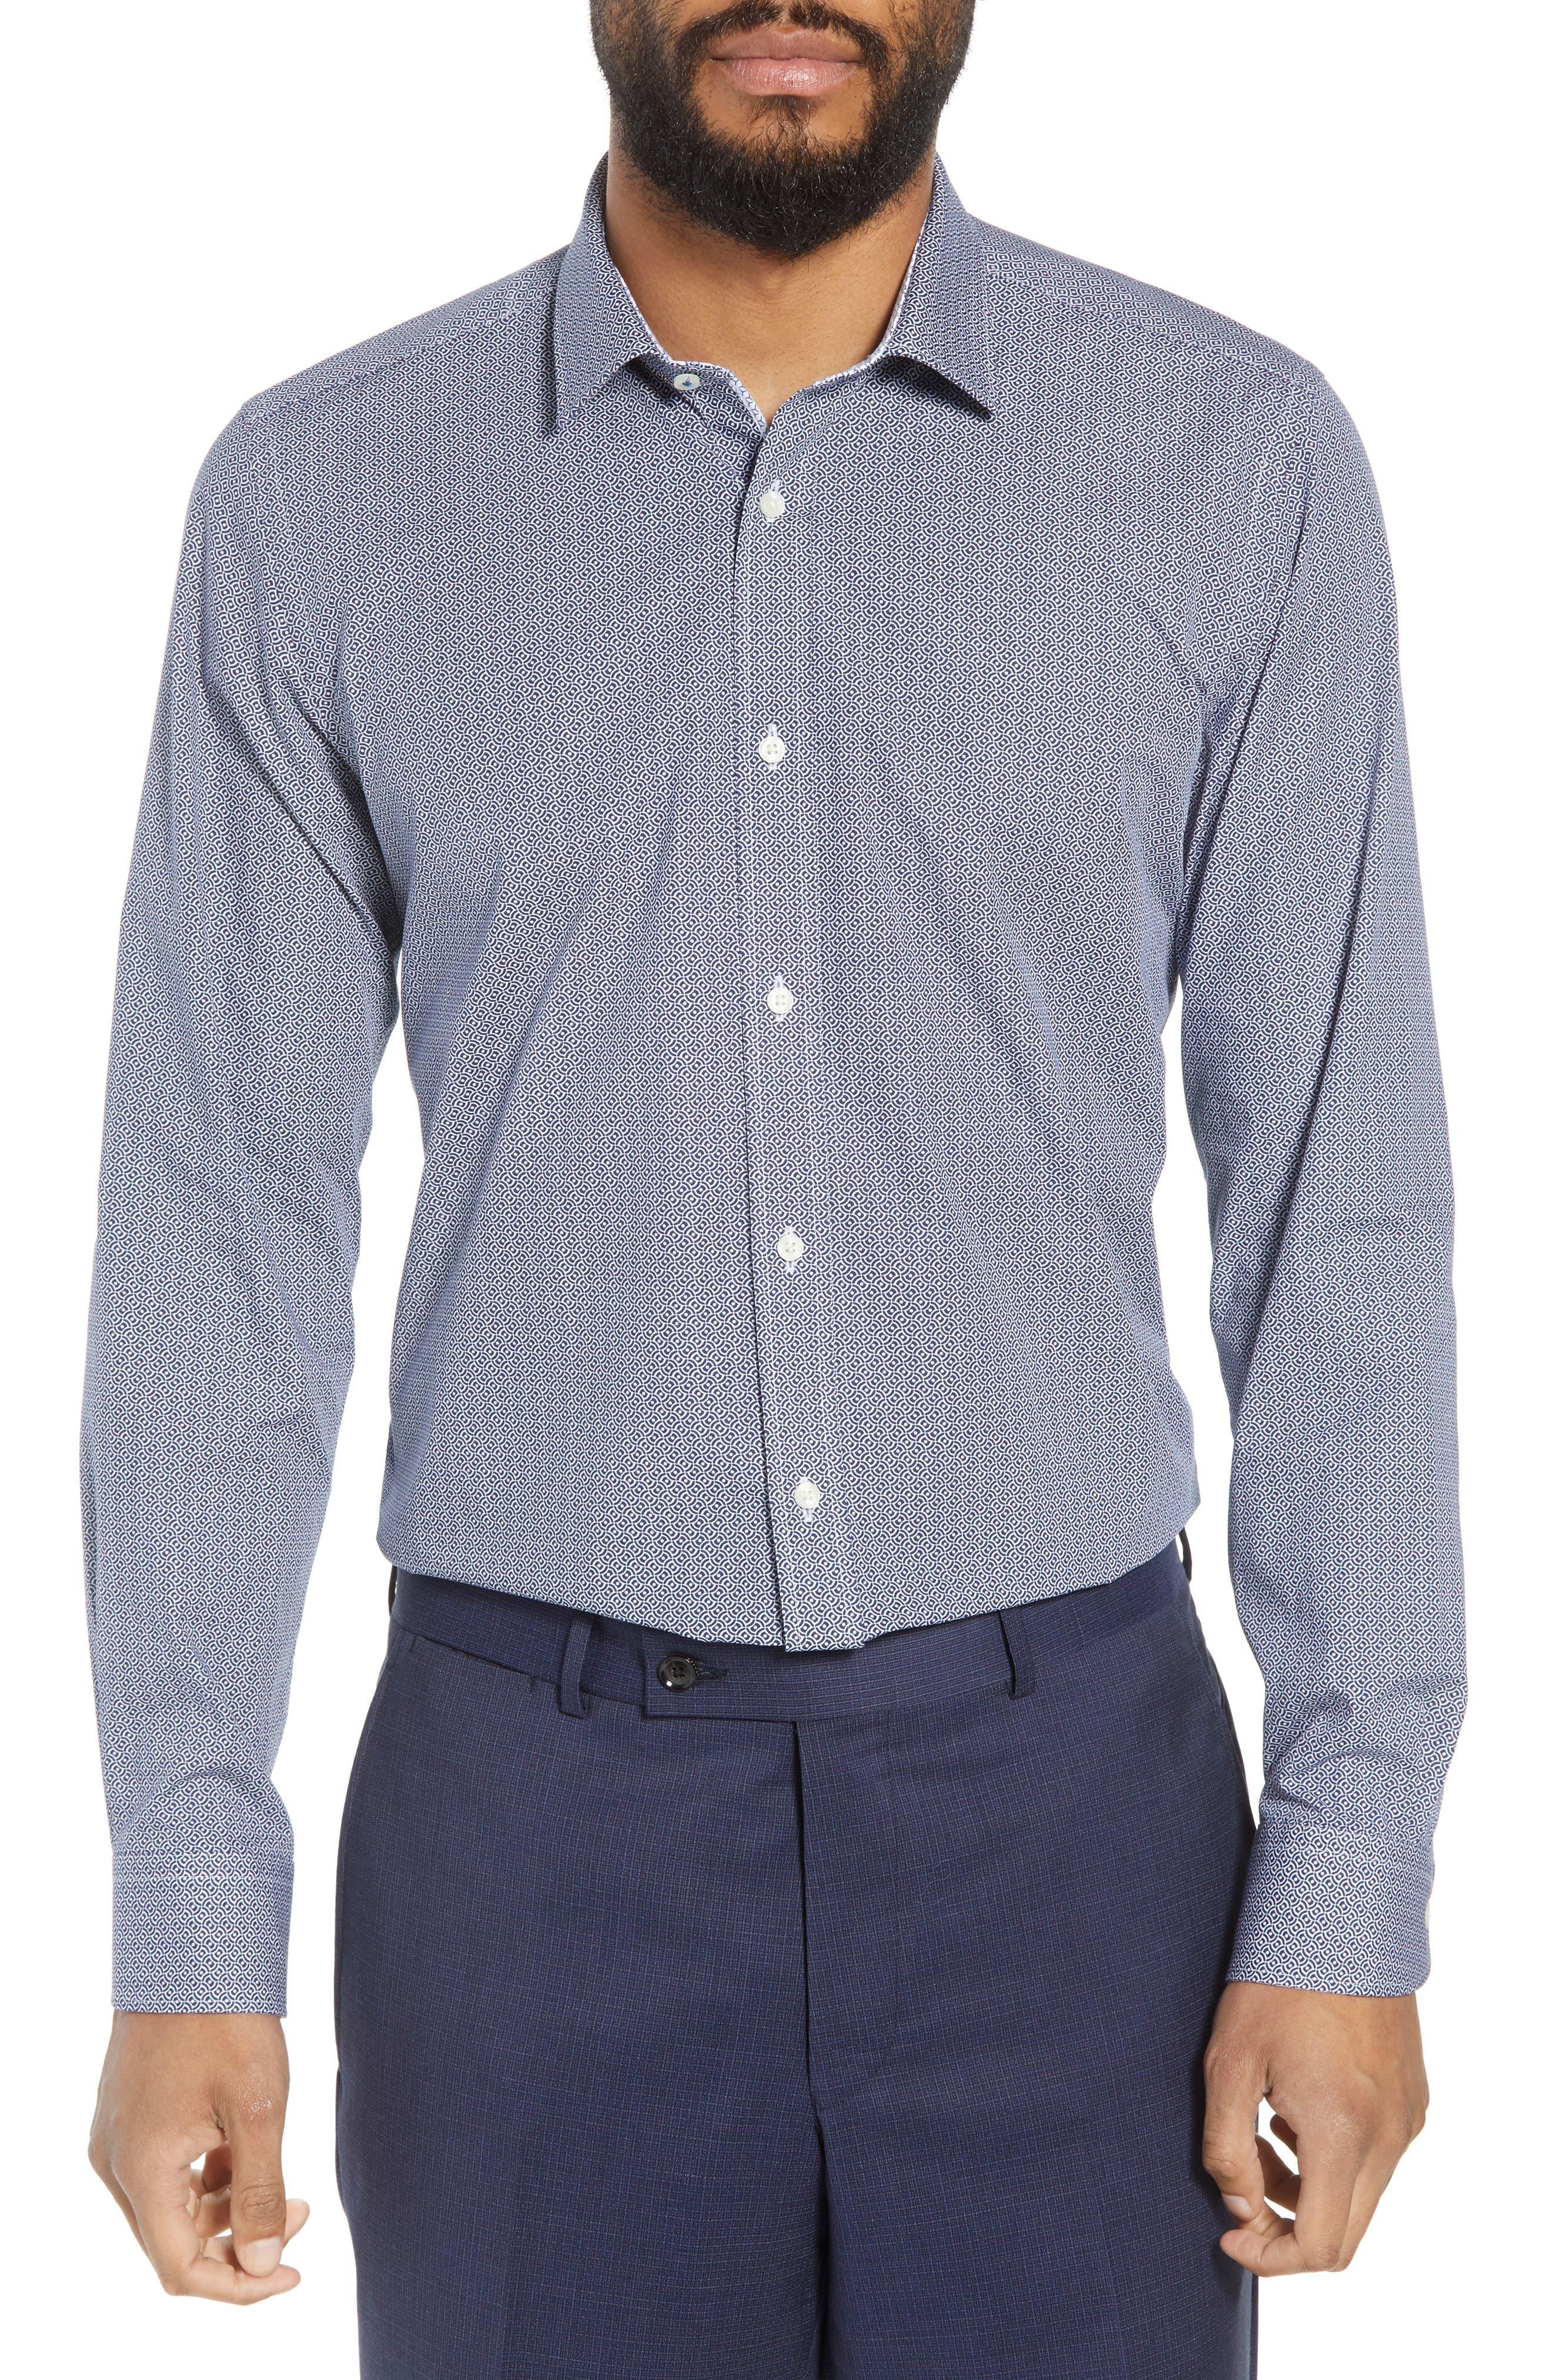 Footz Slim Fit Geometric Dress Shirt,                         Main,                         color, NAVY